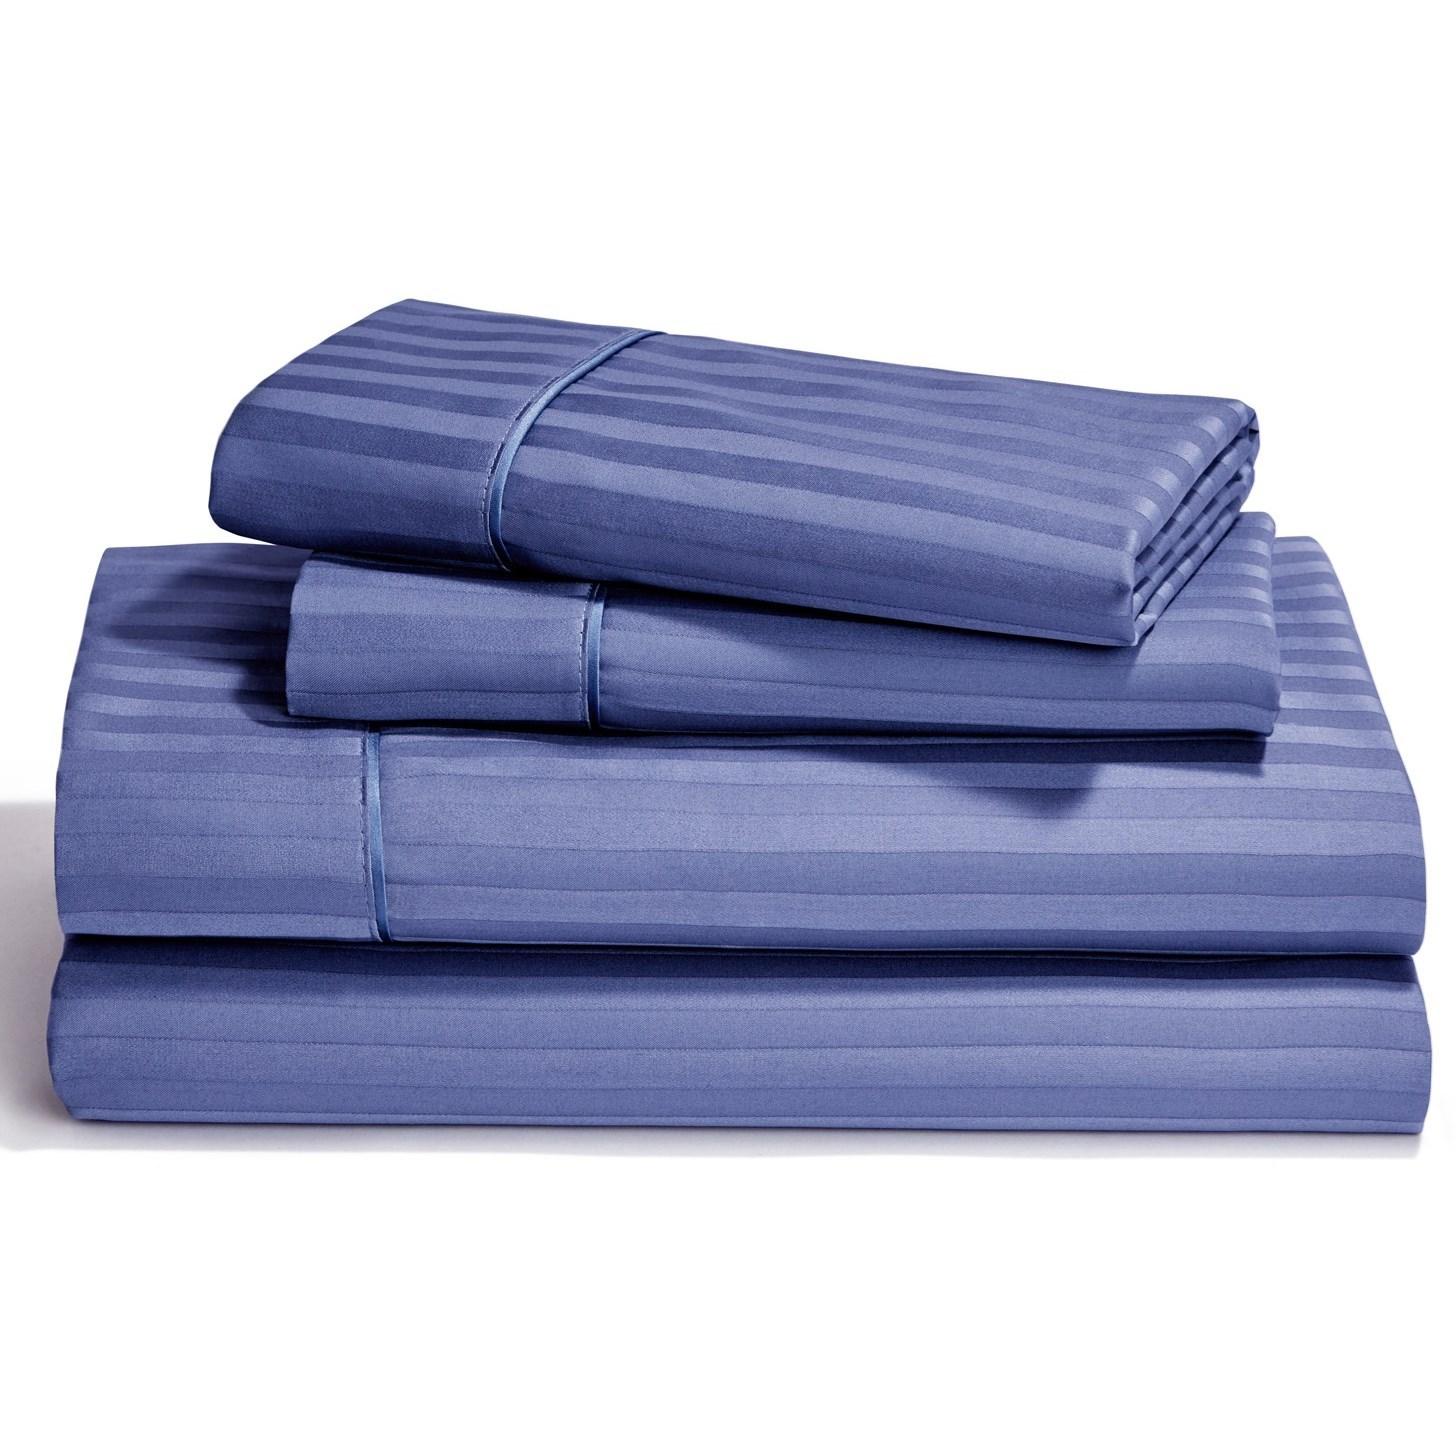 Egyptian Cotton Sheet Sets Split King Denim Flat Sheet Set by Tempur-Pedic® at Sparks HomeStore